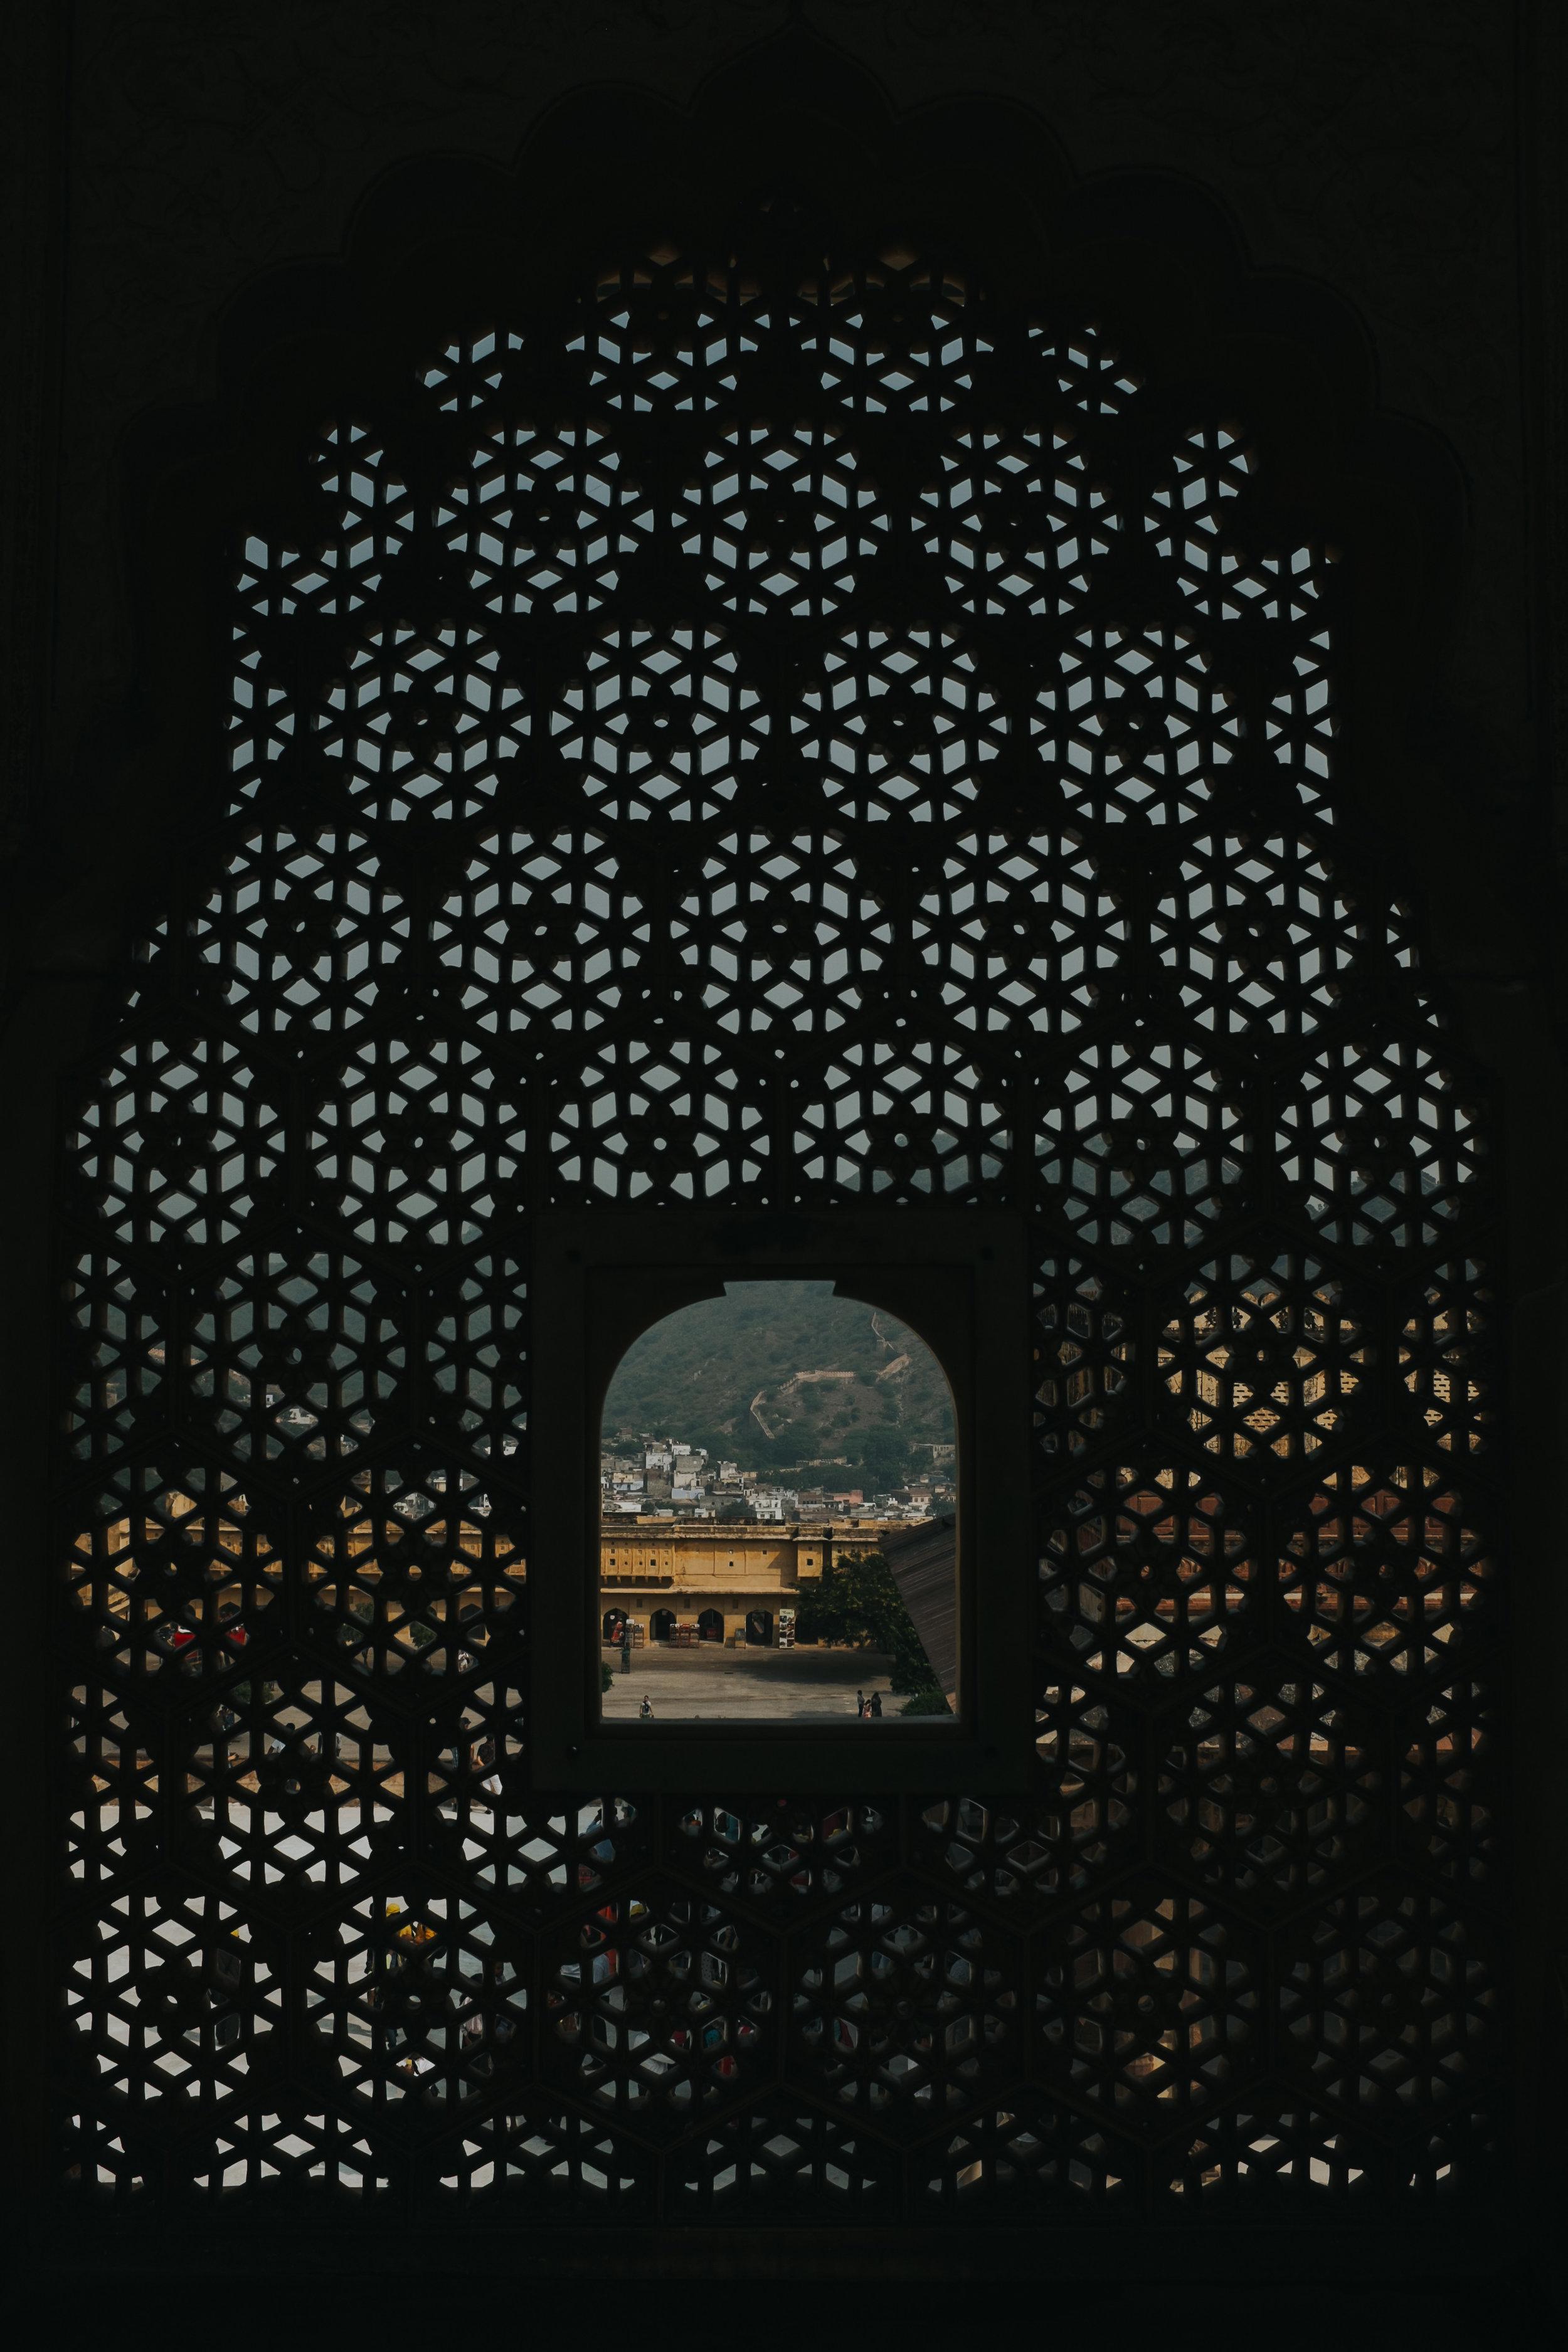 INDI2560.jpg